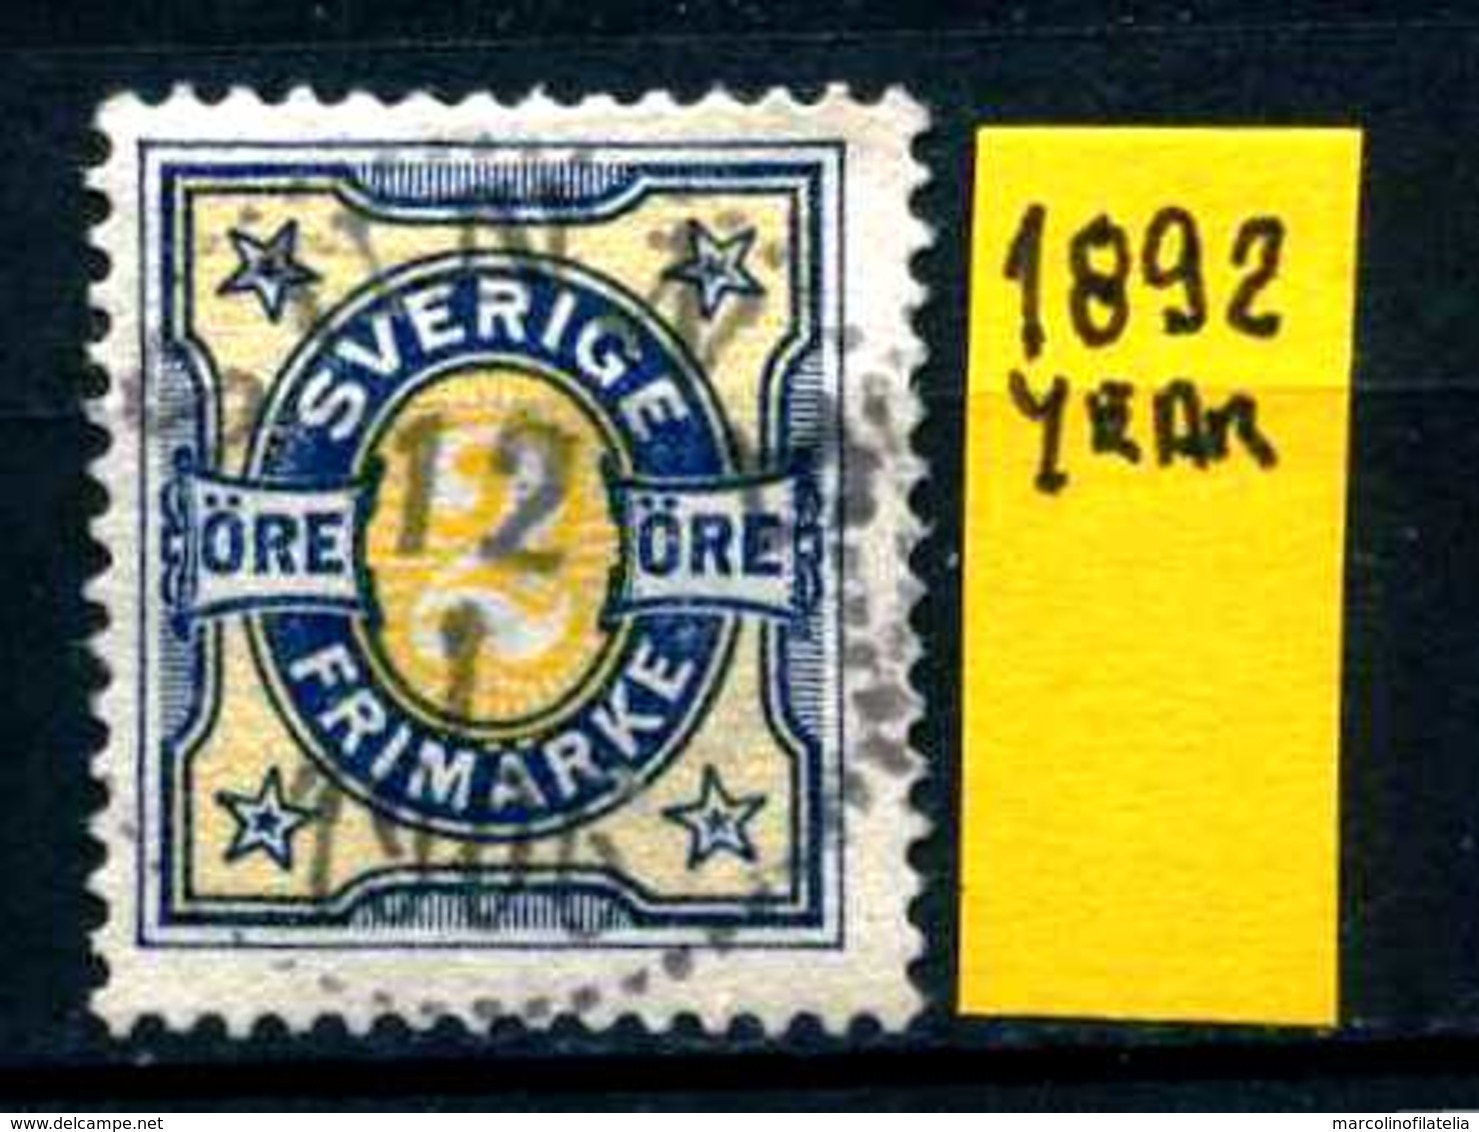 SVEZIA - SVERIGE - Year 1892 - Usato - Used - Utilisè - Gebraucht. - Usati